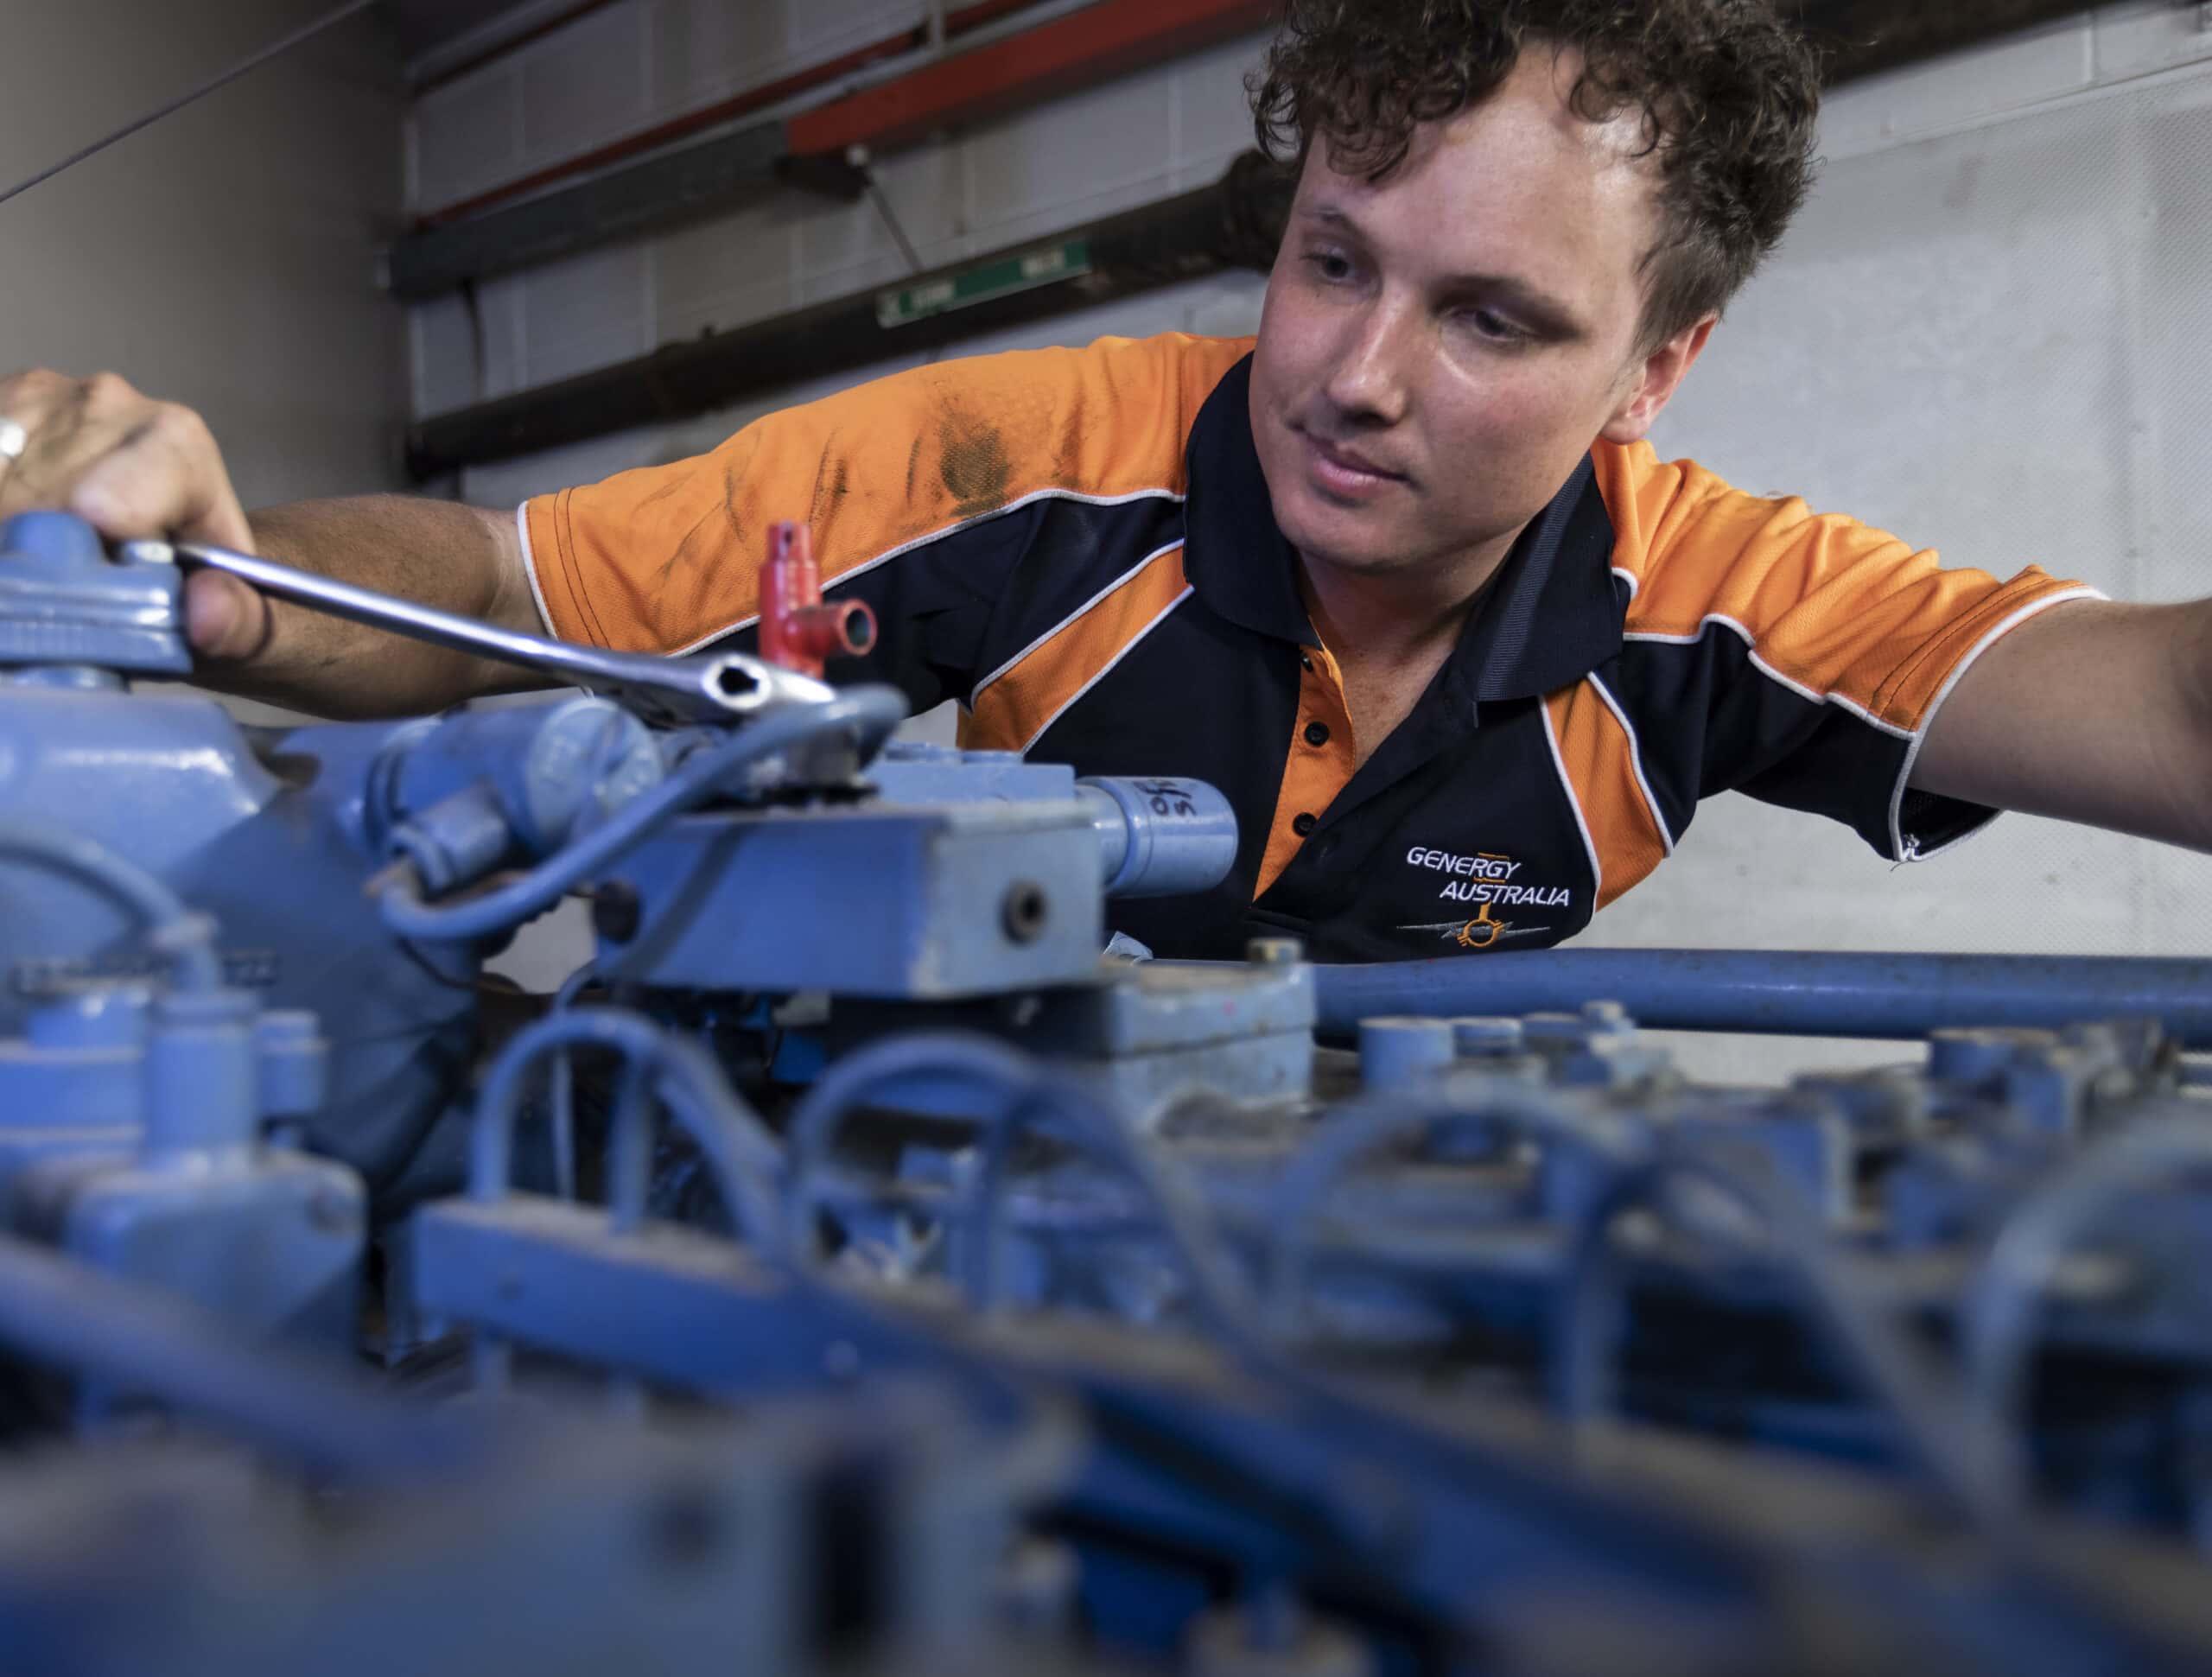 generator refueling - Genergy Australia